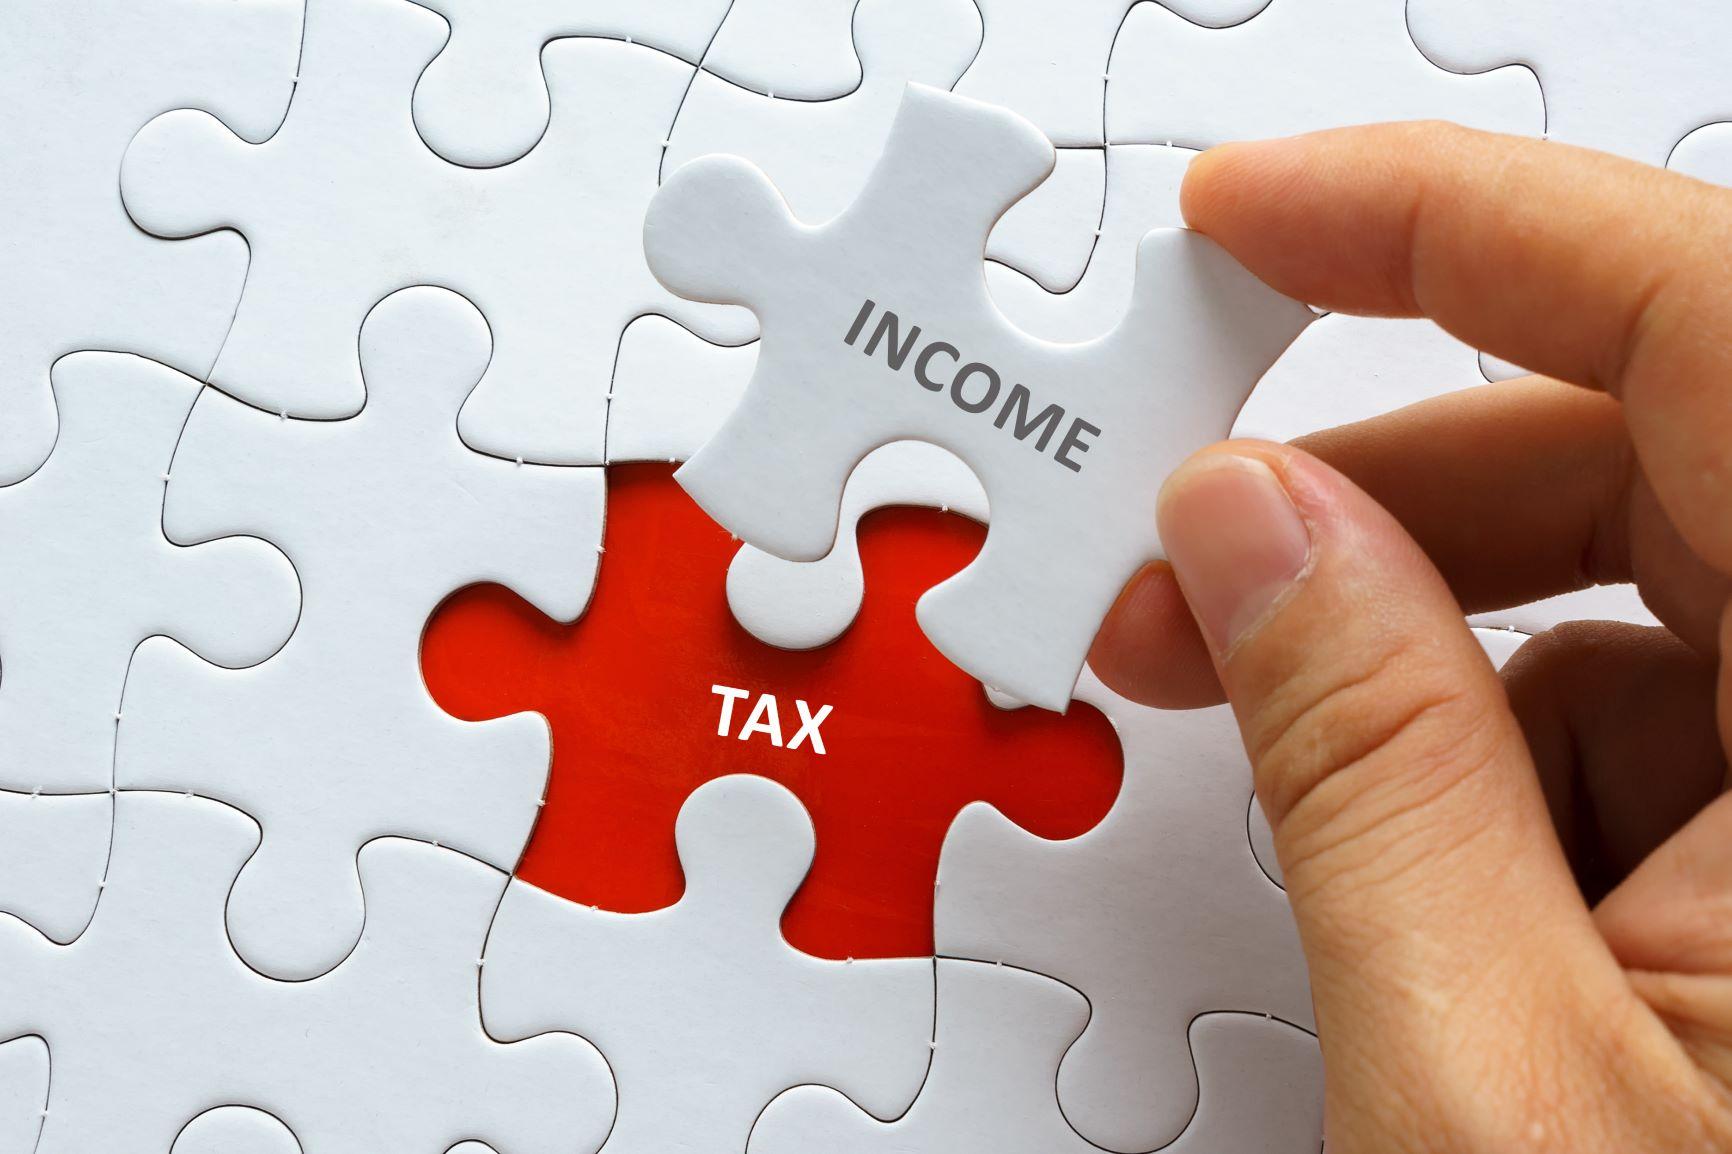 """Income Tax"" puzzle piece"